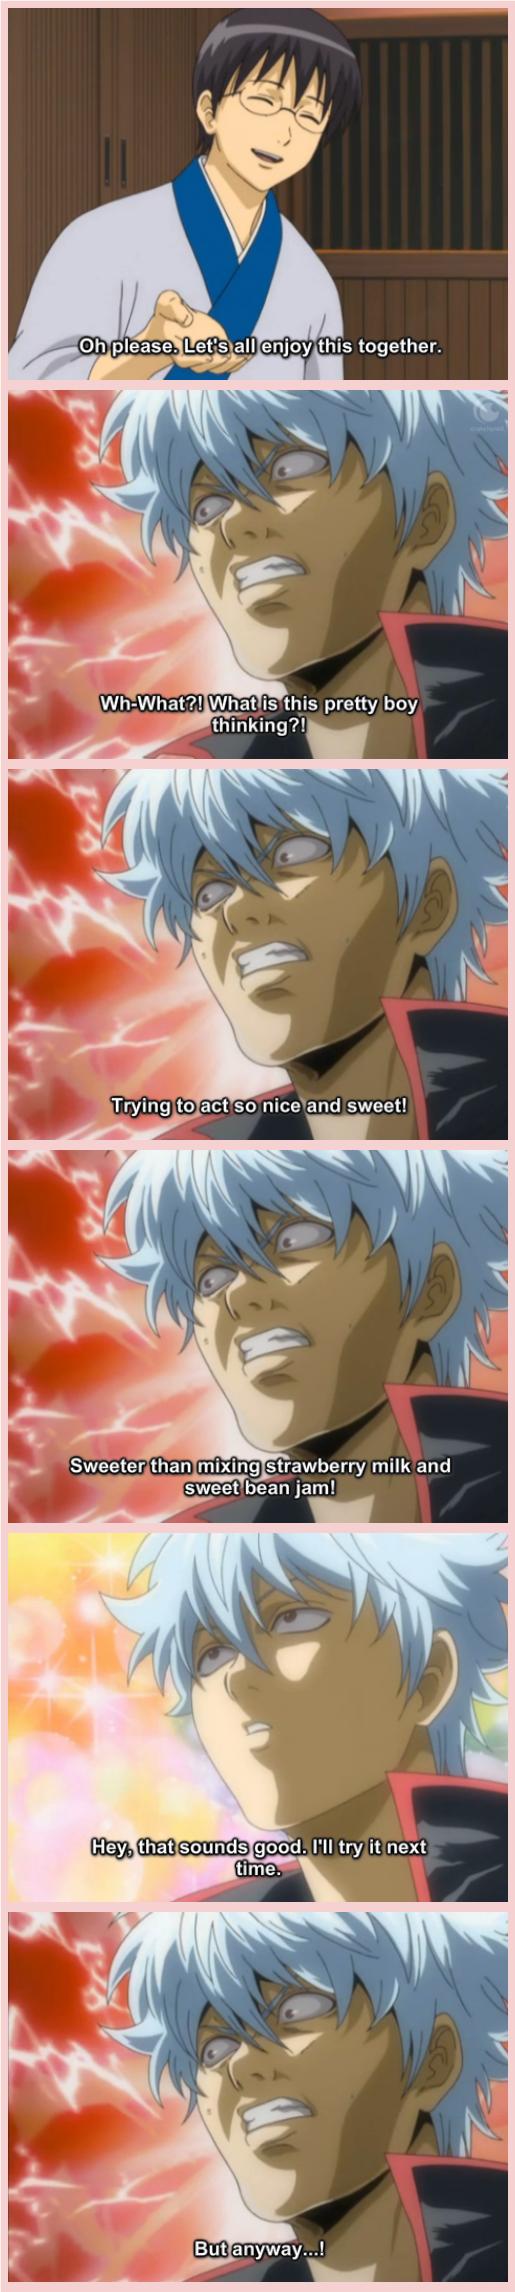 gurasan. Gintama.. Gin x Strawberry Milk is best ship. Gintama funny Anime